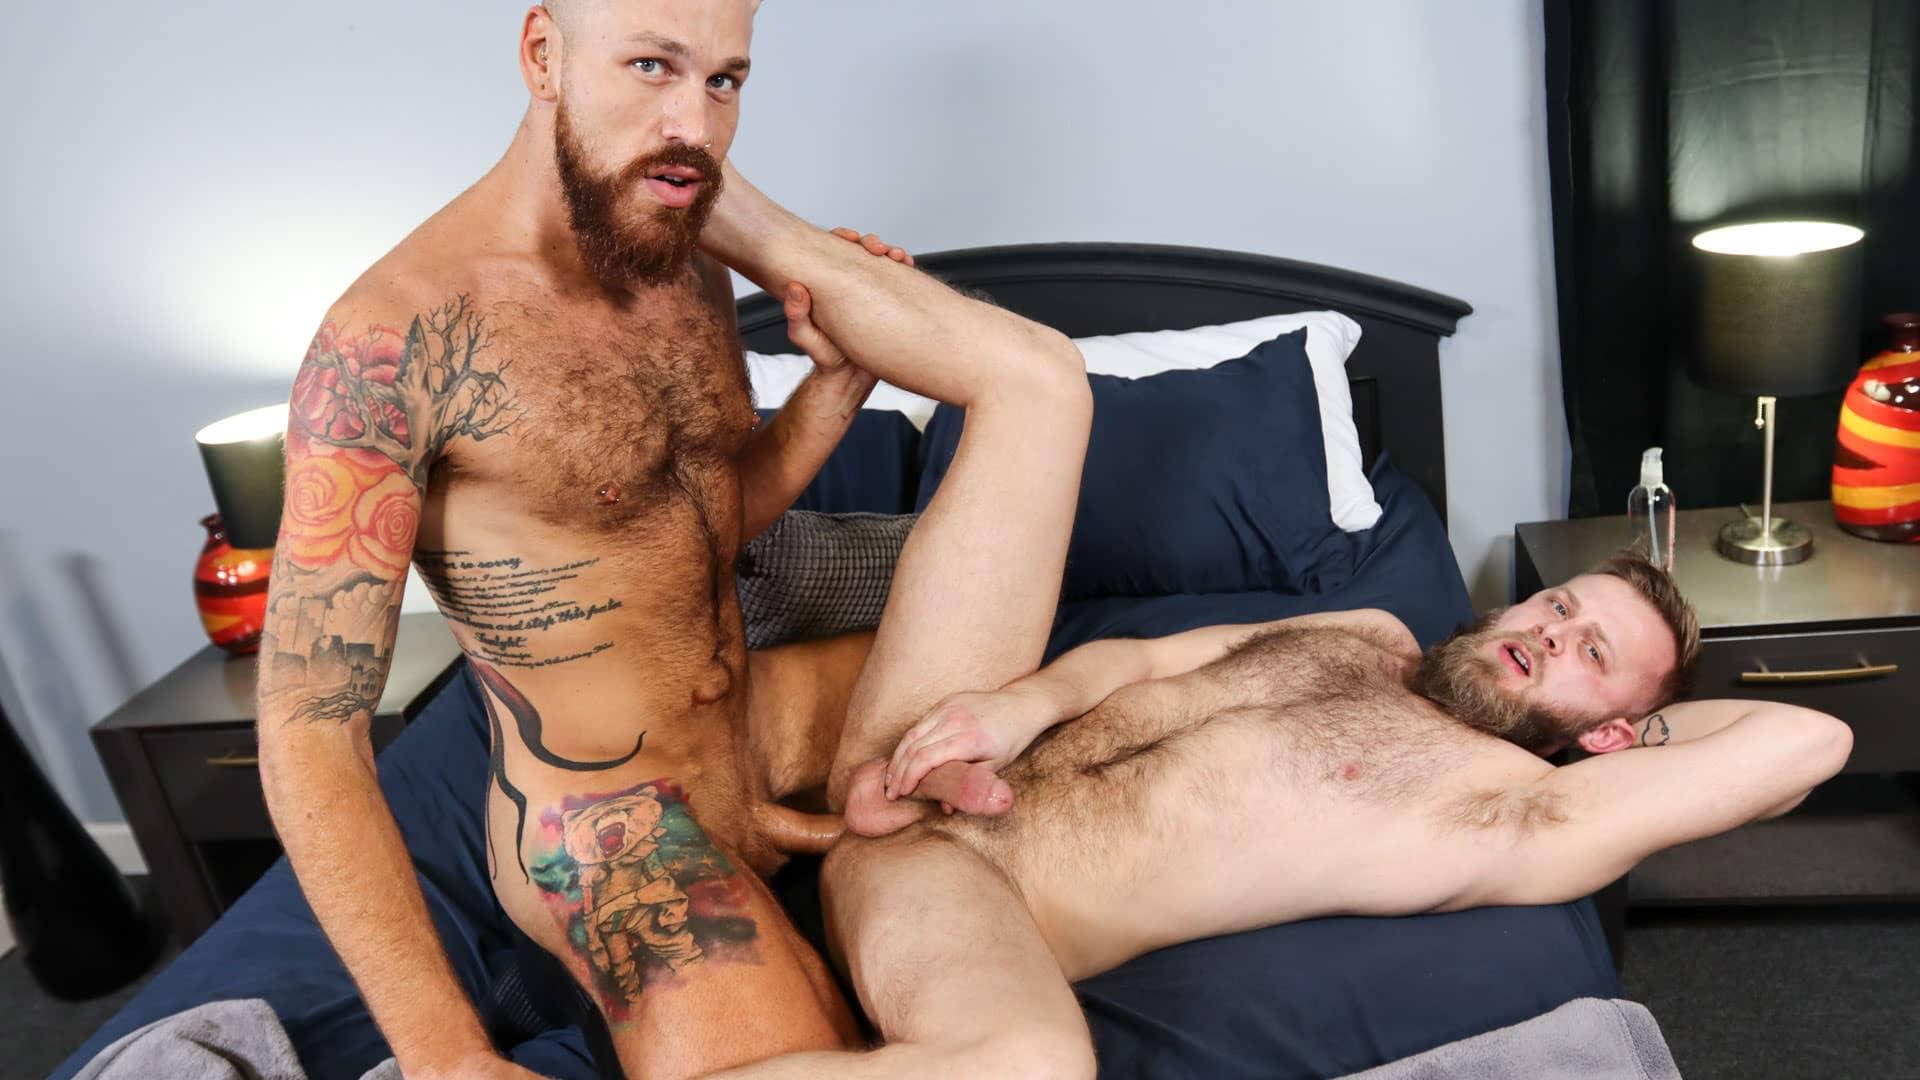 I Love How That Big Dick Feels – Chandler Scott and Parker Logan